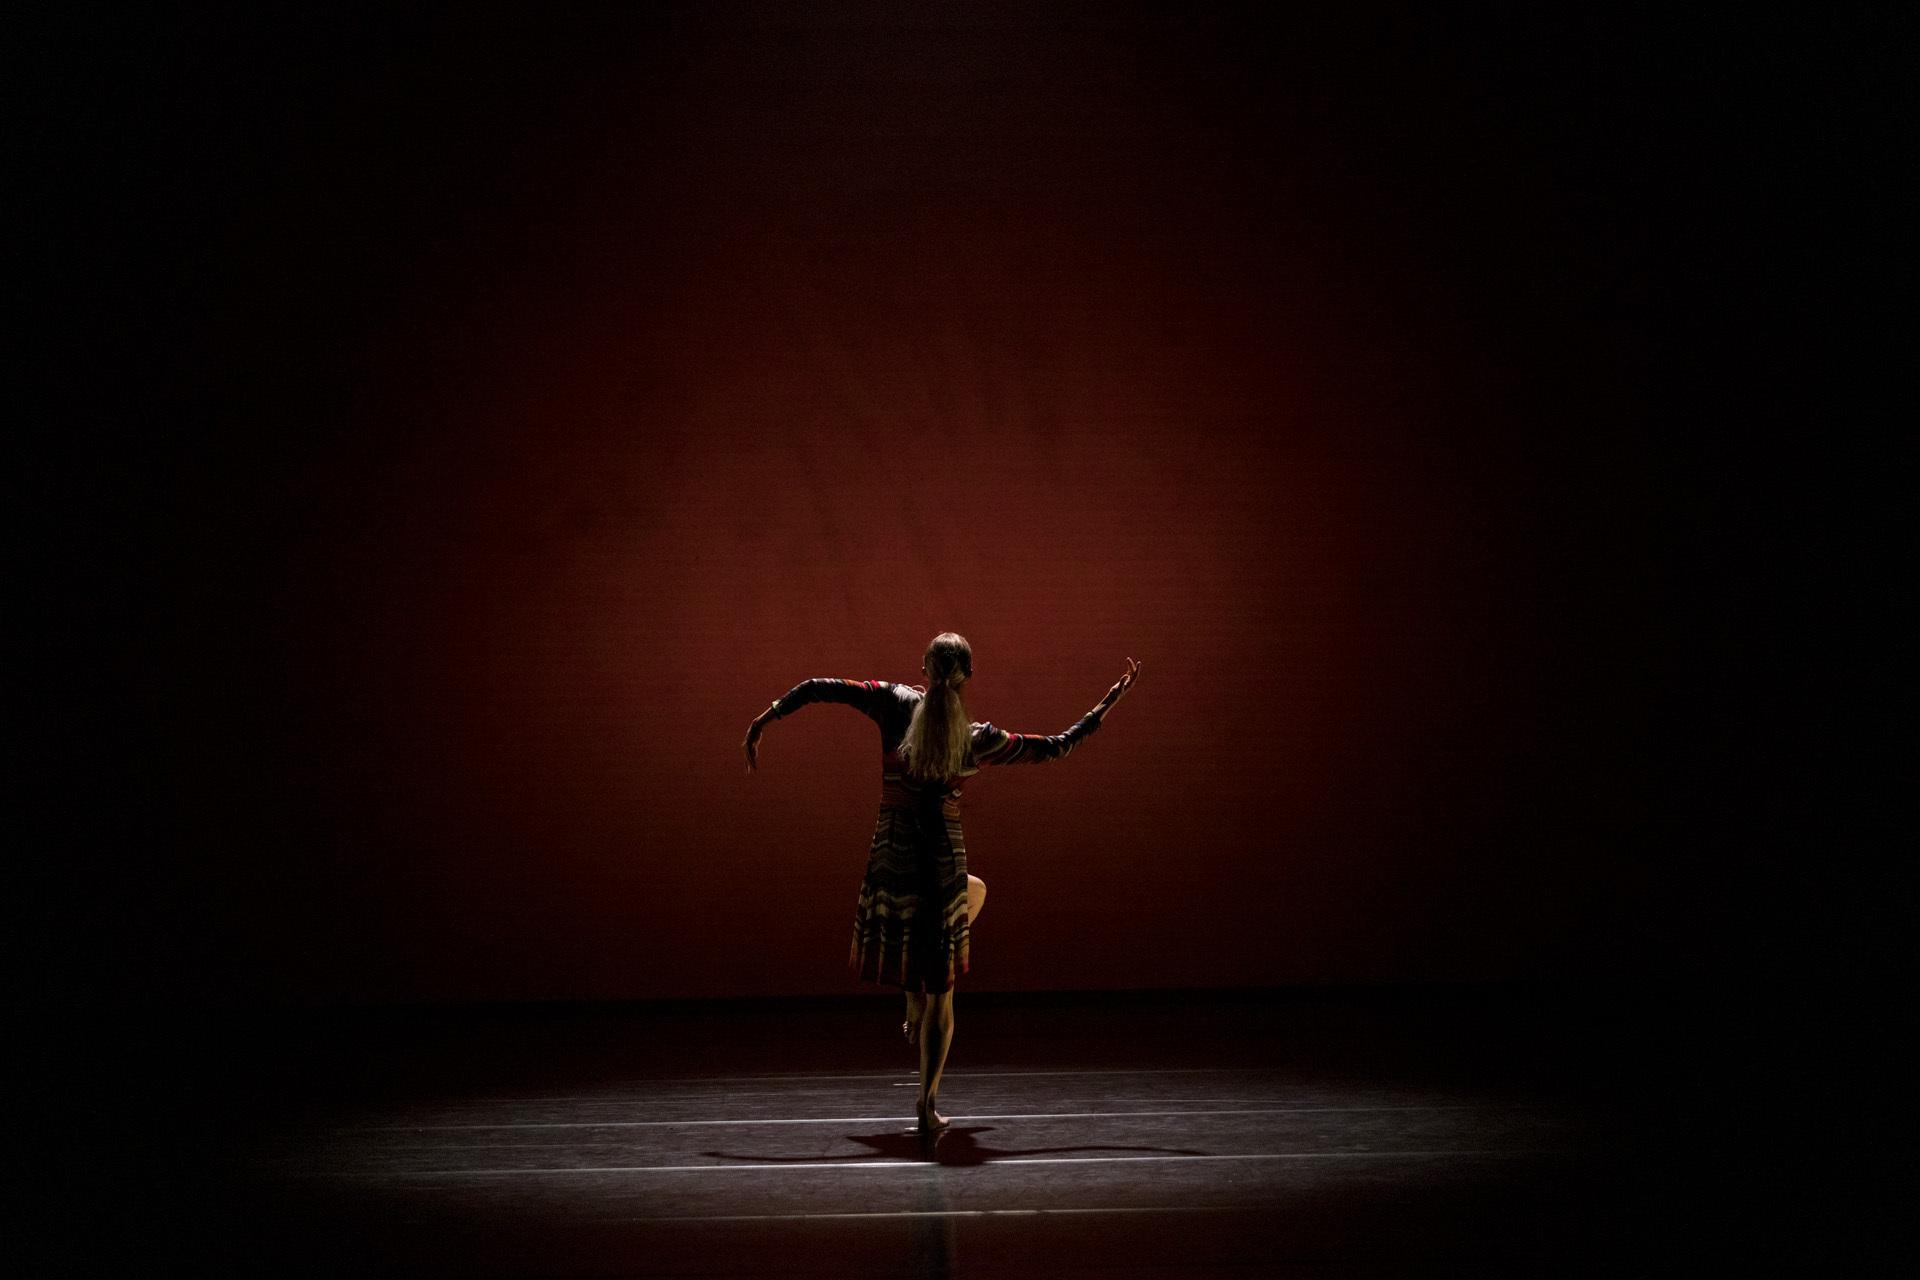 2019_03_01-Parsons-Dance-©-Luca-Vantusso-213213-EOSR0991